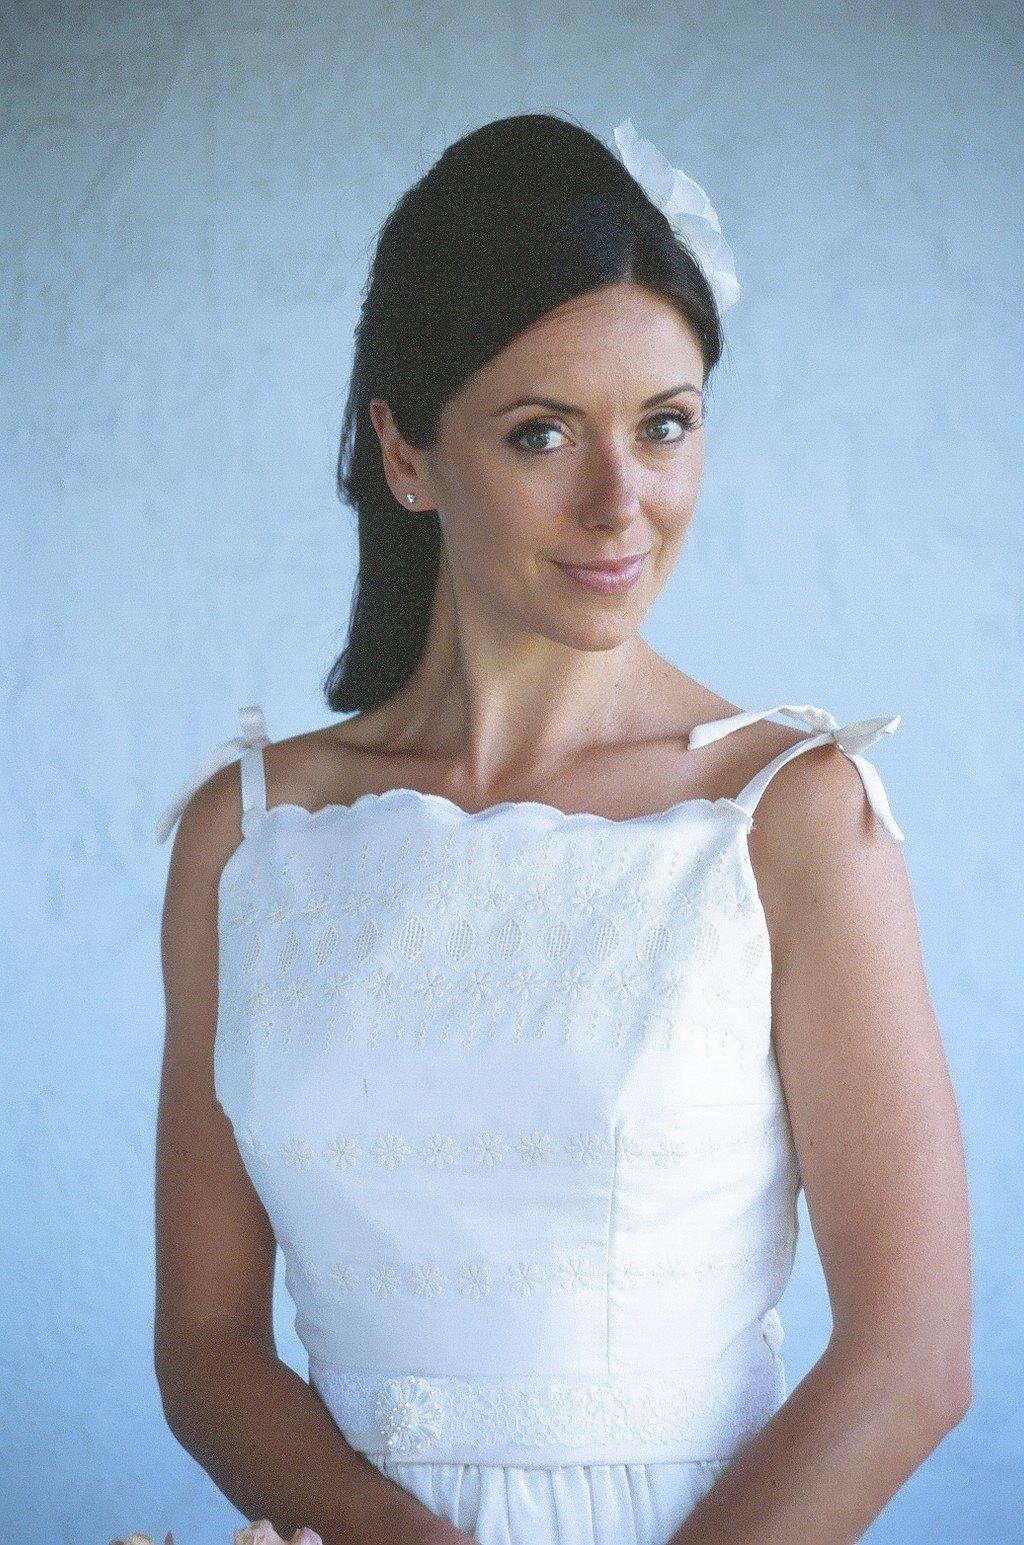 White-lace-wedding-dress-amy-jo-tatum-bridal-couture-tie-spaghetti-straps.full